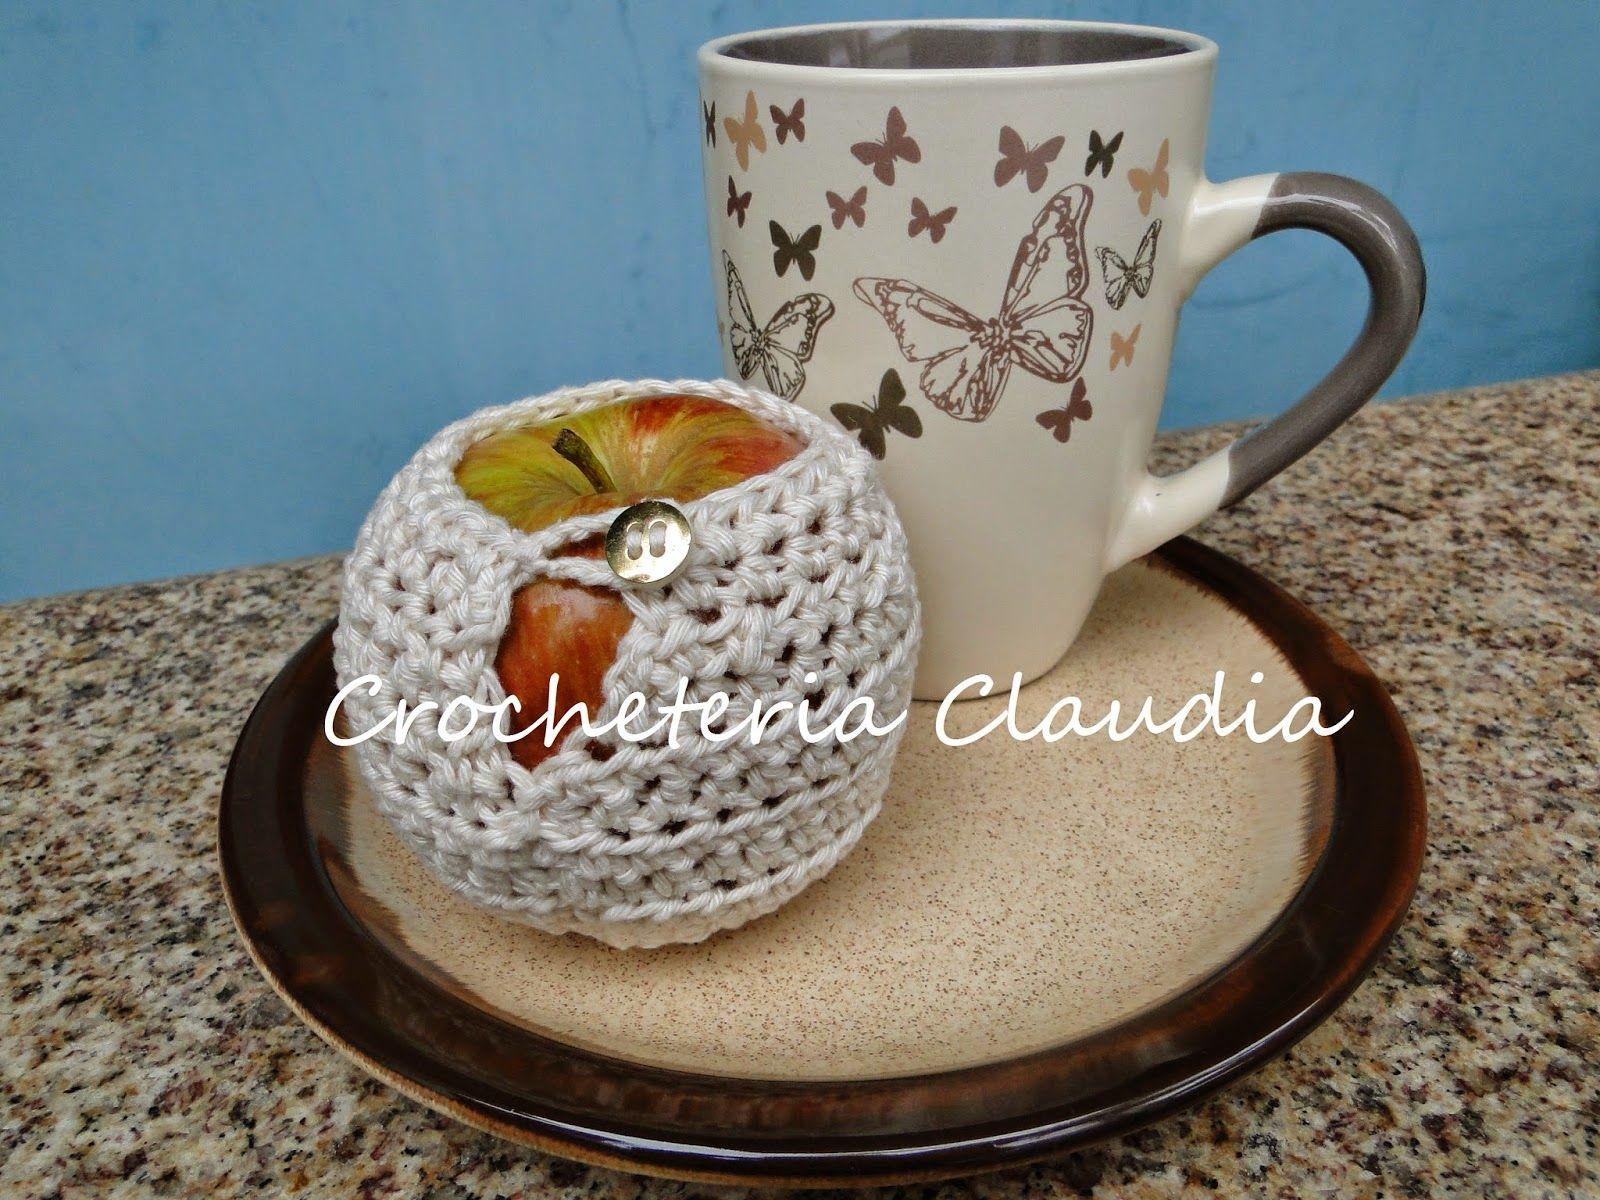 Crocheteria   Claudia: Maçã para o lanche?